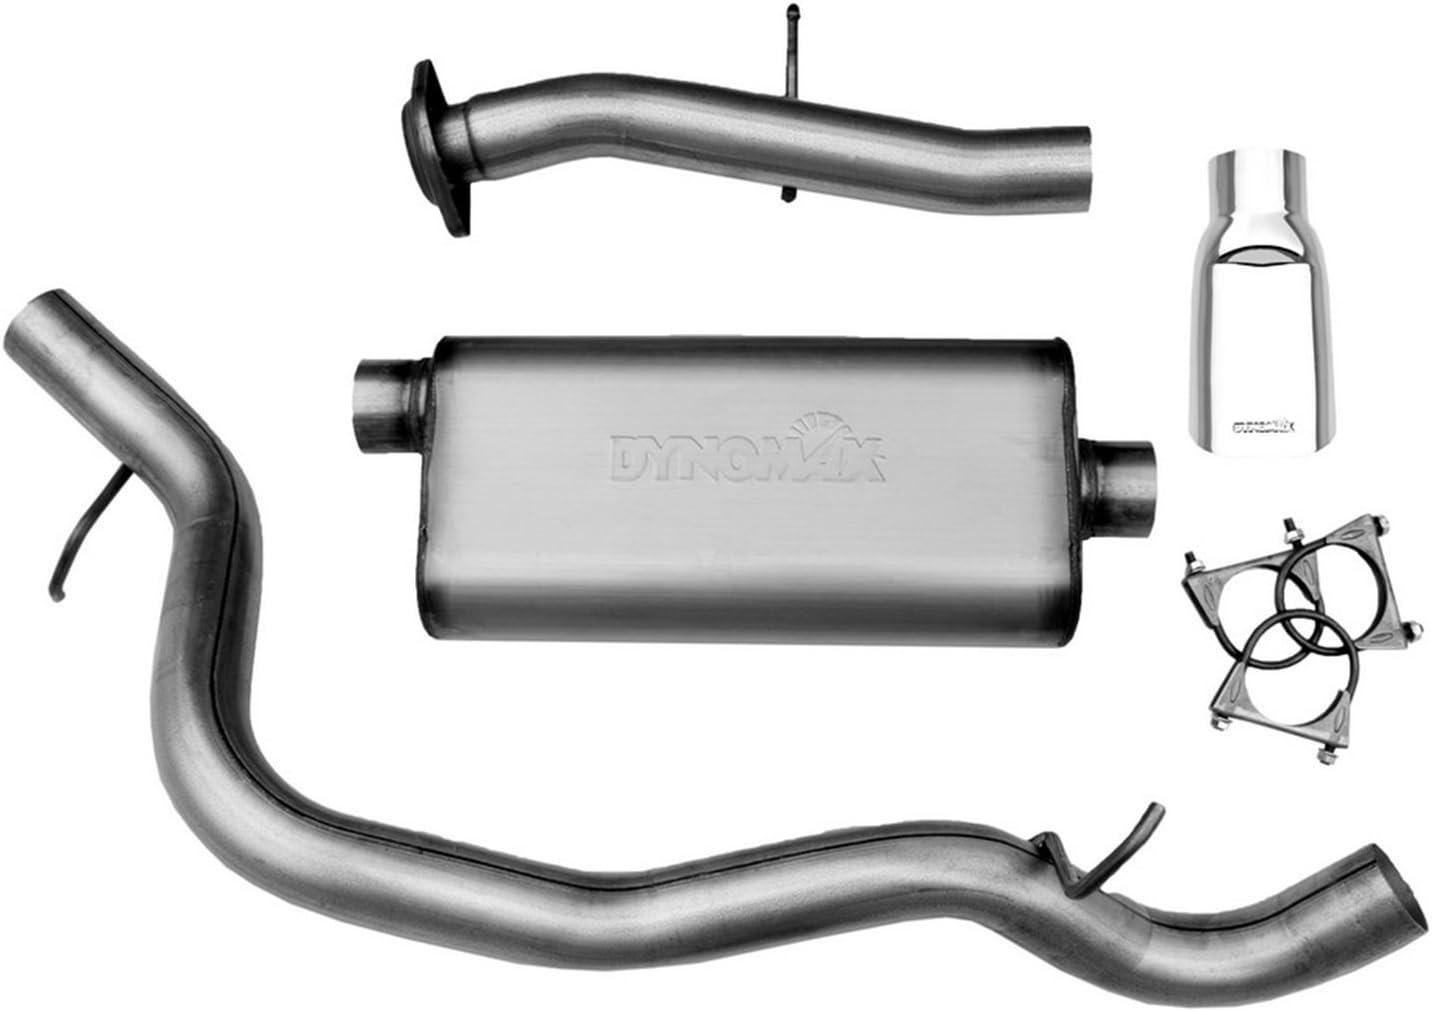 Dynomax 19361 Exhaust System